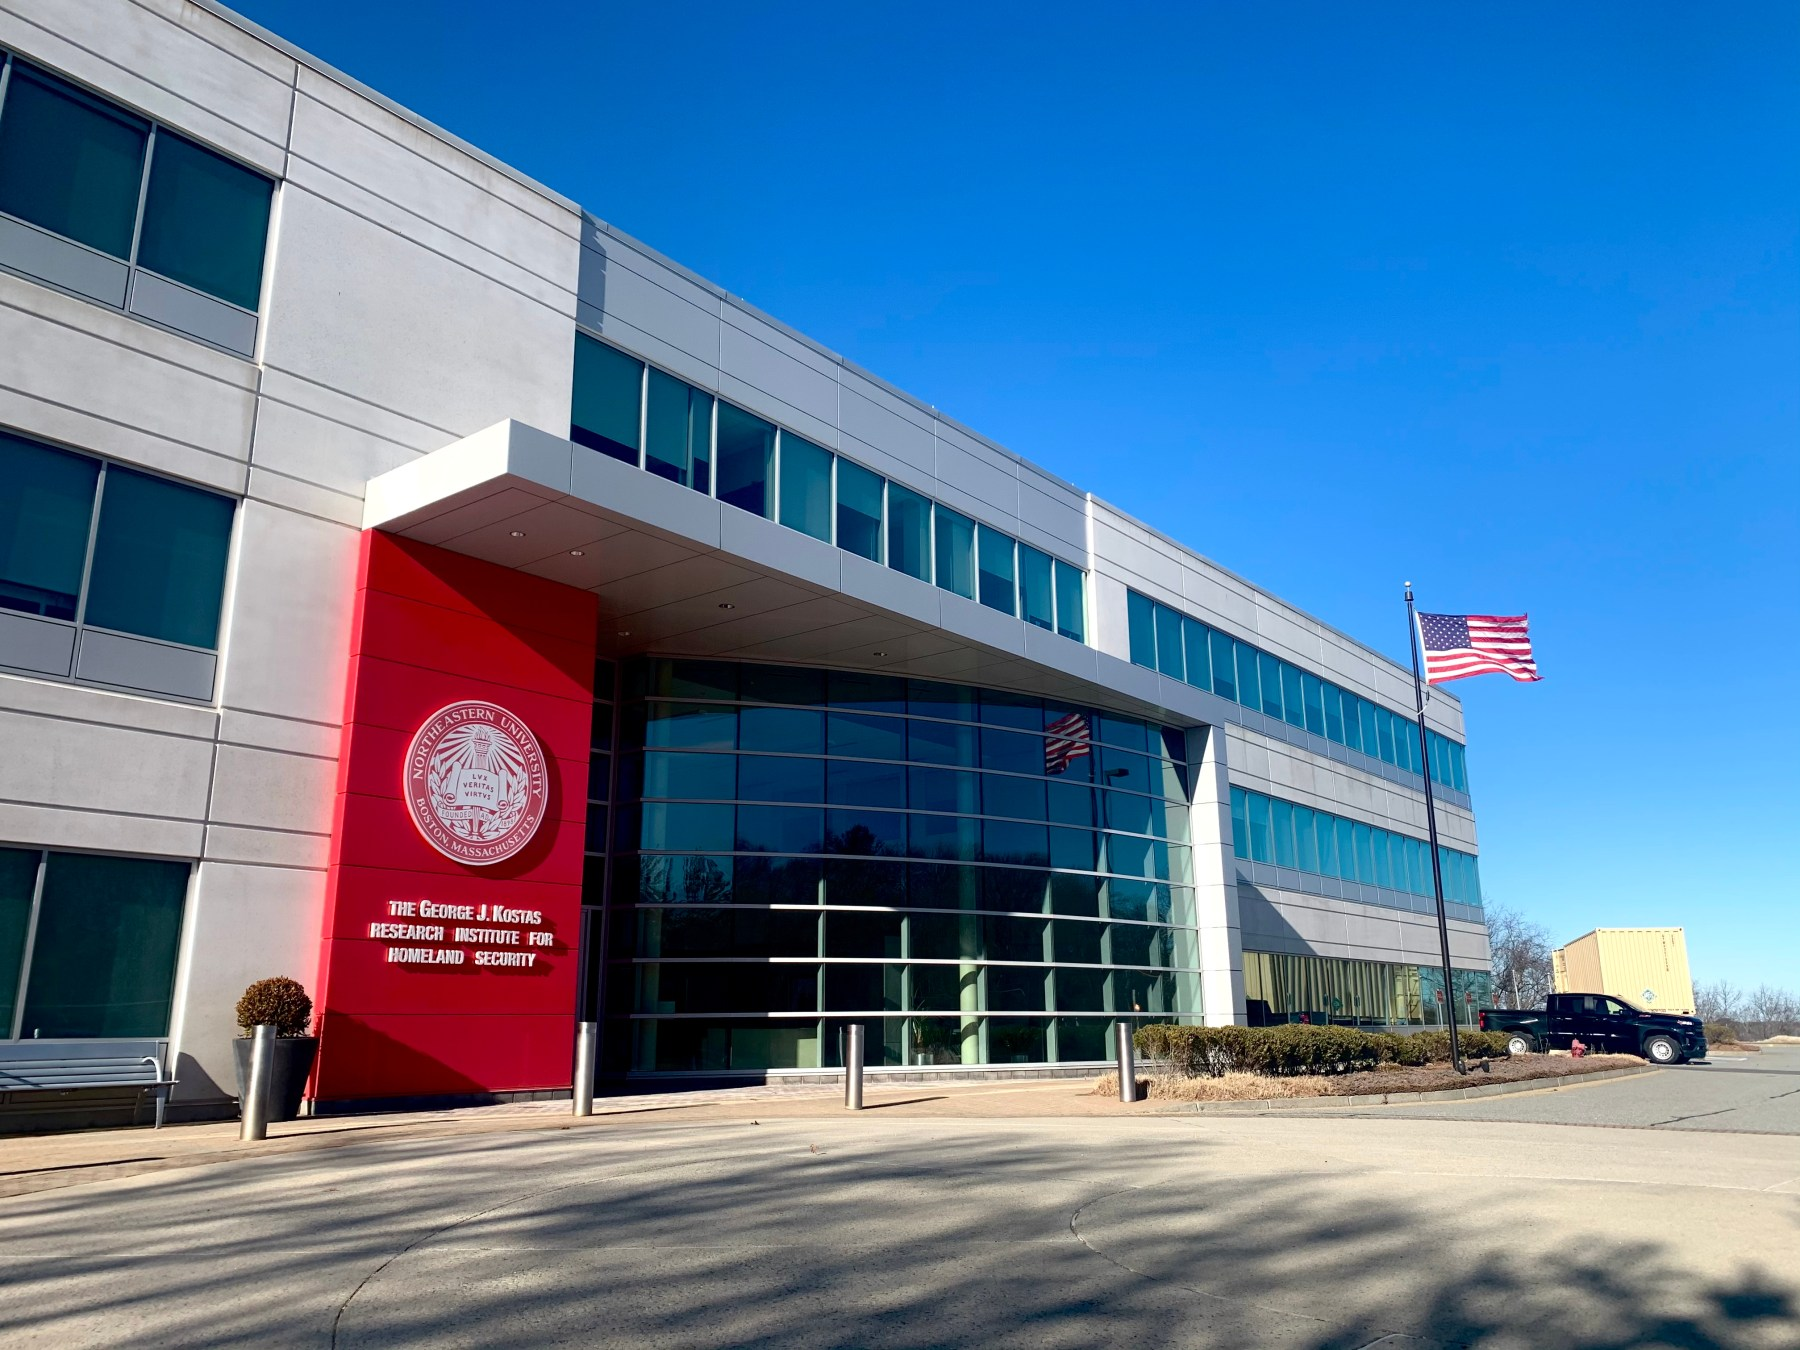 George J. Kostas Research Institute for Homeland Security, 141 South Bedford Street, Burlington, MA